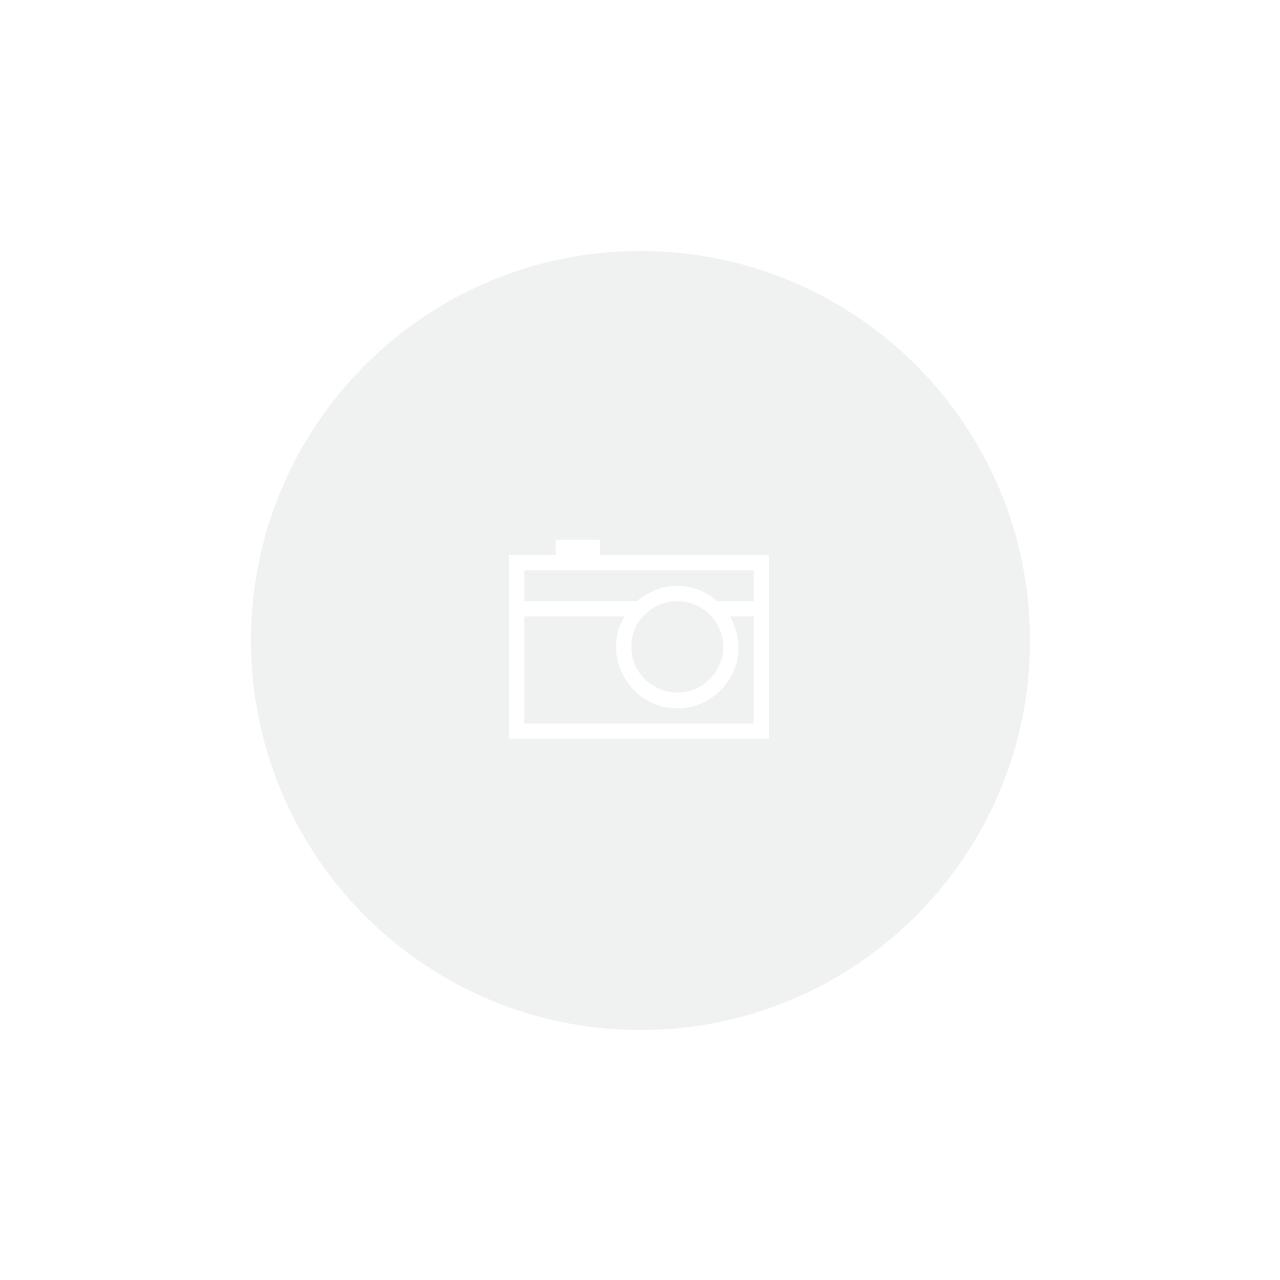 Papel Artesanal Indiano - Ref. 44